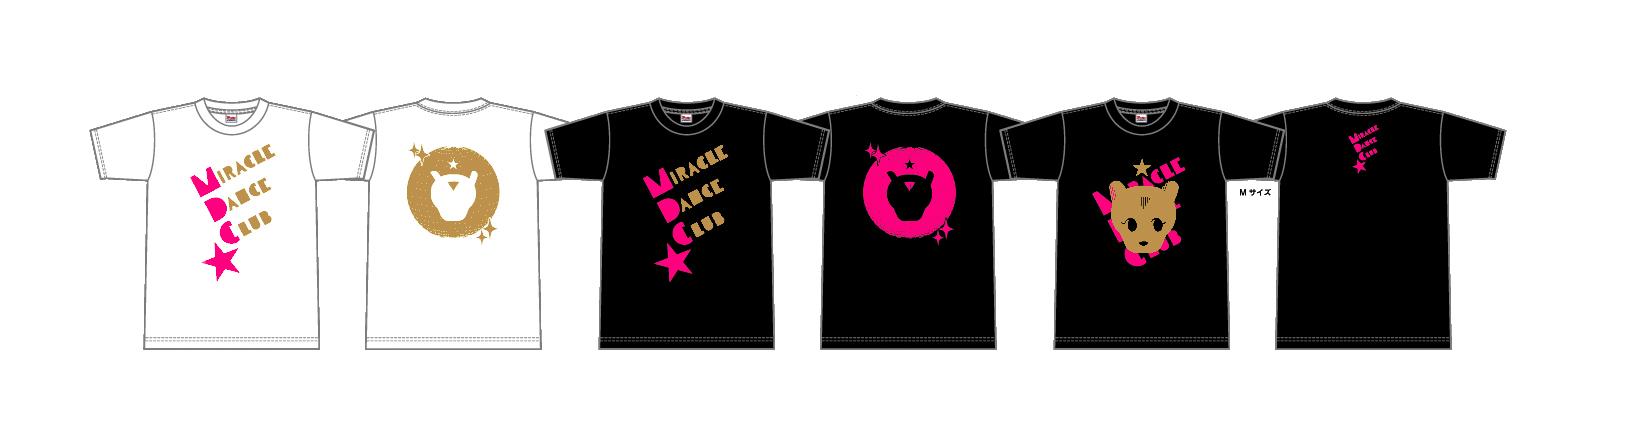 Miracle Dance Club T-shirts